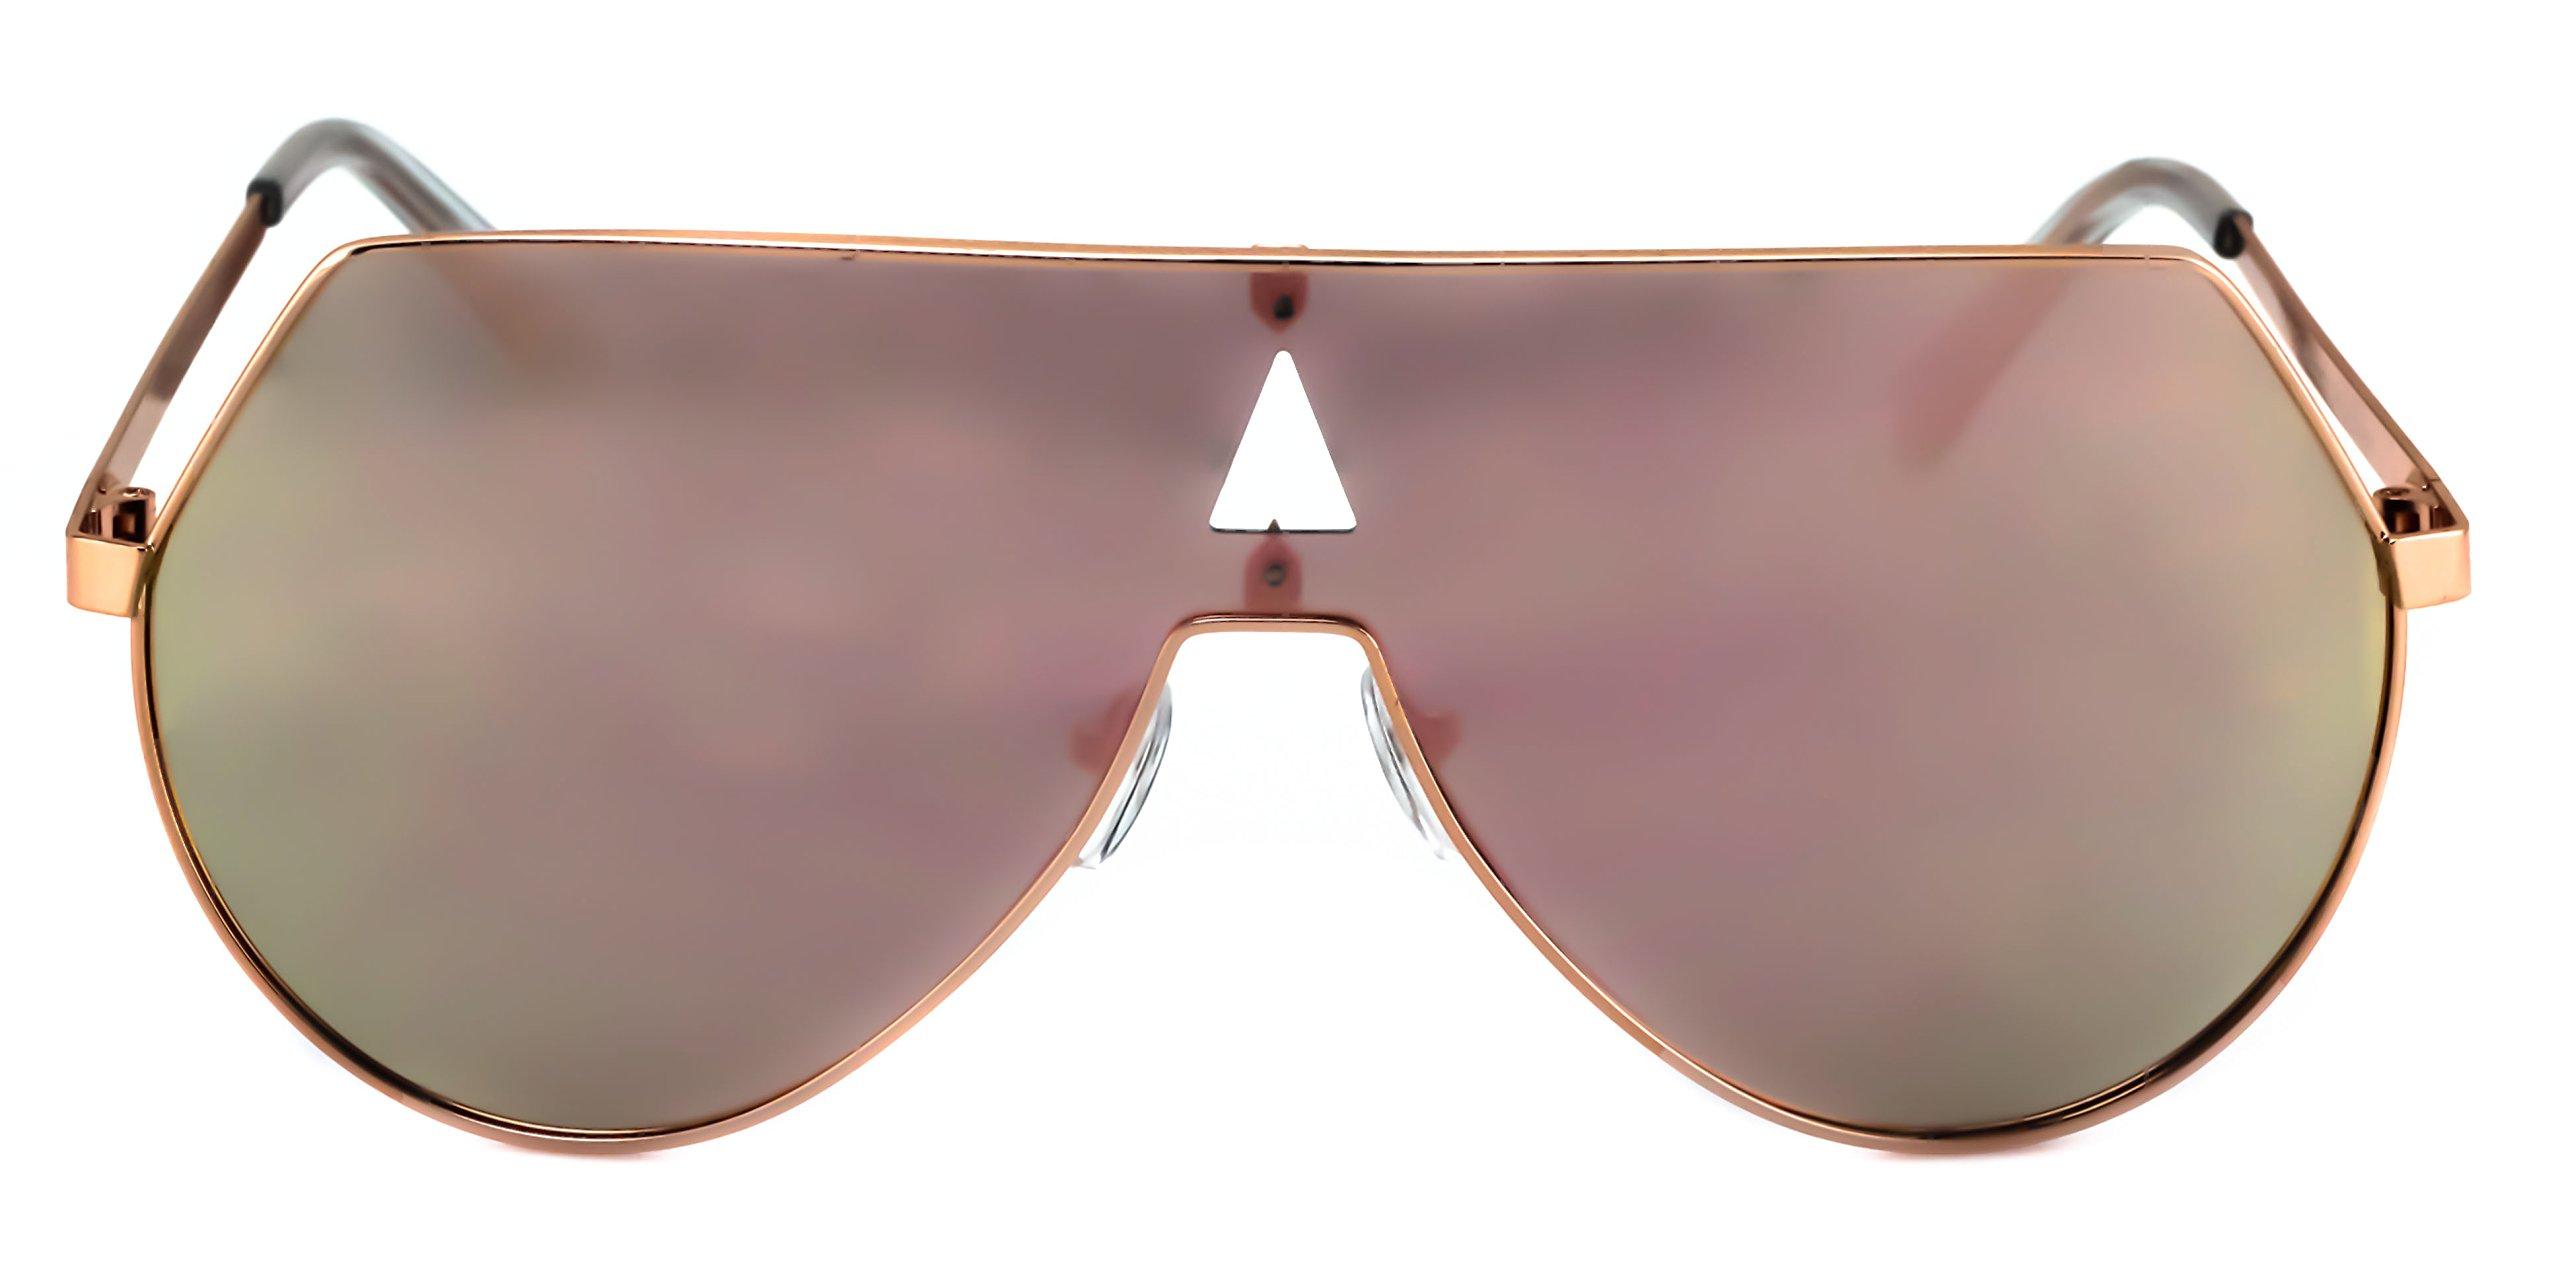 Elite Oversize Unisex Flat Top Aviator Retro Shield Mirrored Lens Rimless Sunglasses (Rose Pink Mirror, 5.8) by EliteGlasses (Image #5)